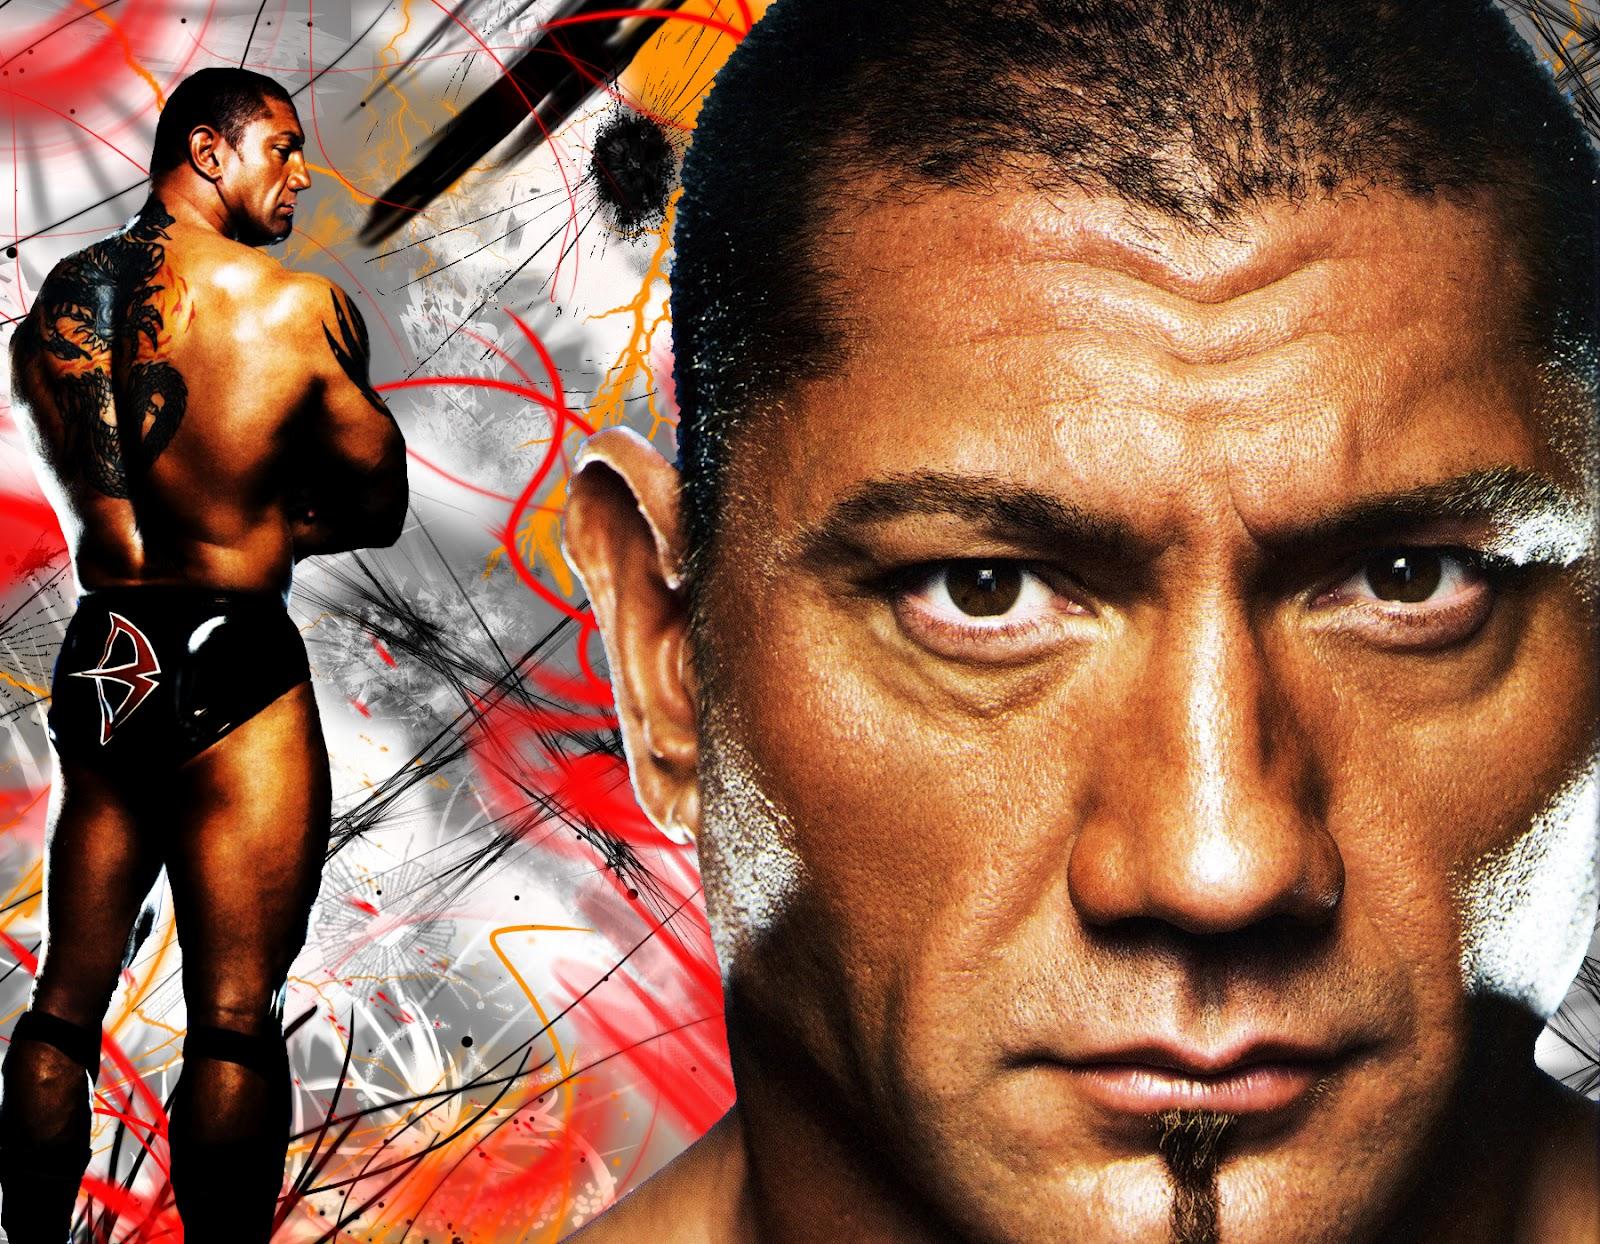 WWE Superstar Wallpaper Wallpaper amp Pictures 1600x1244